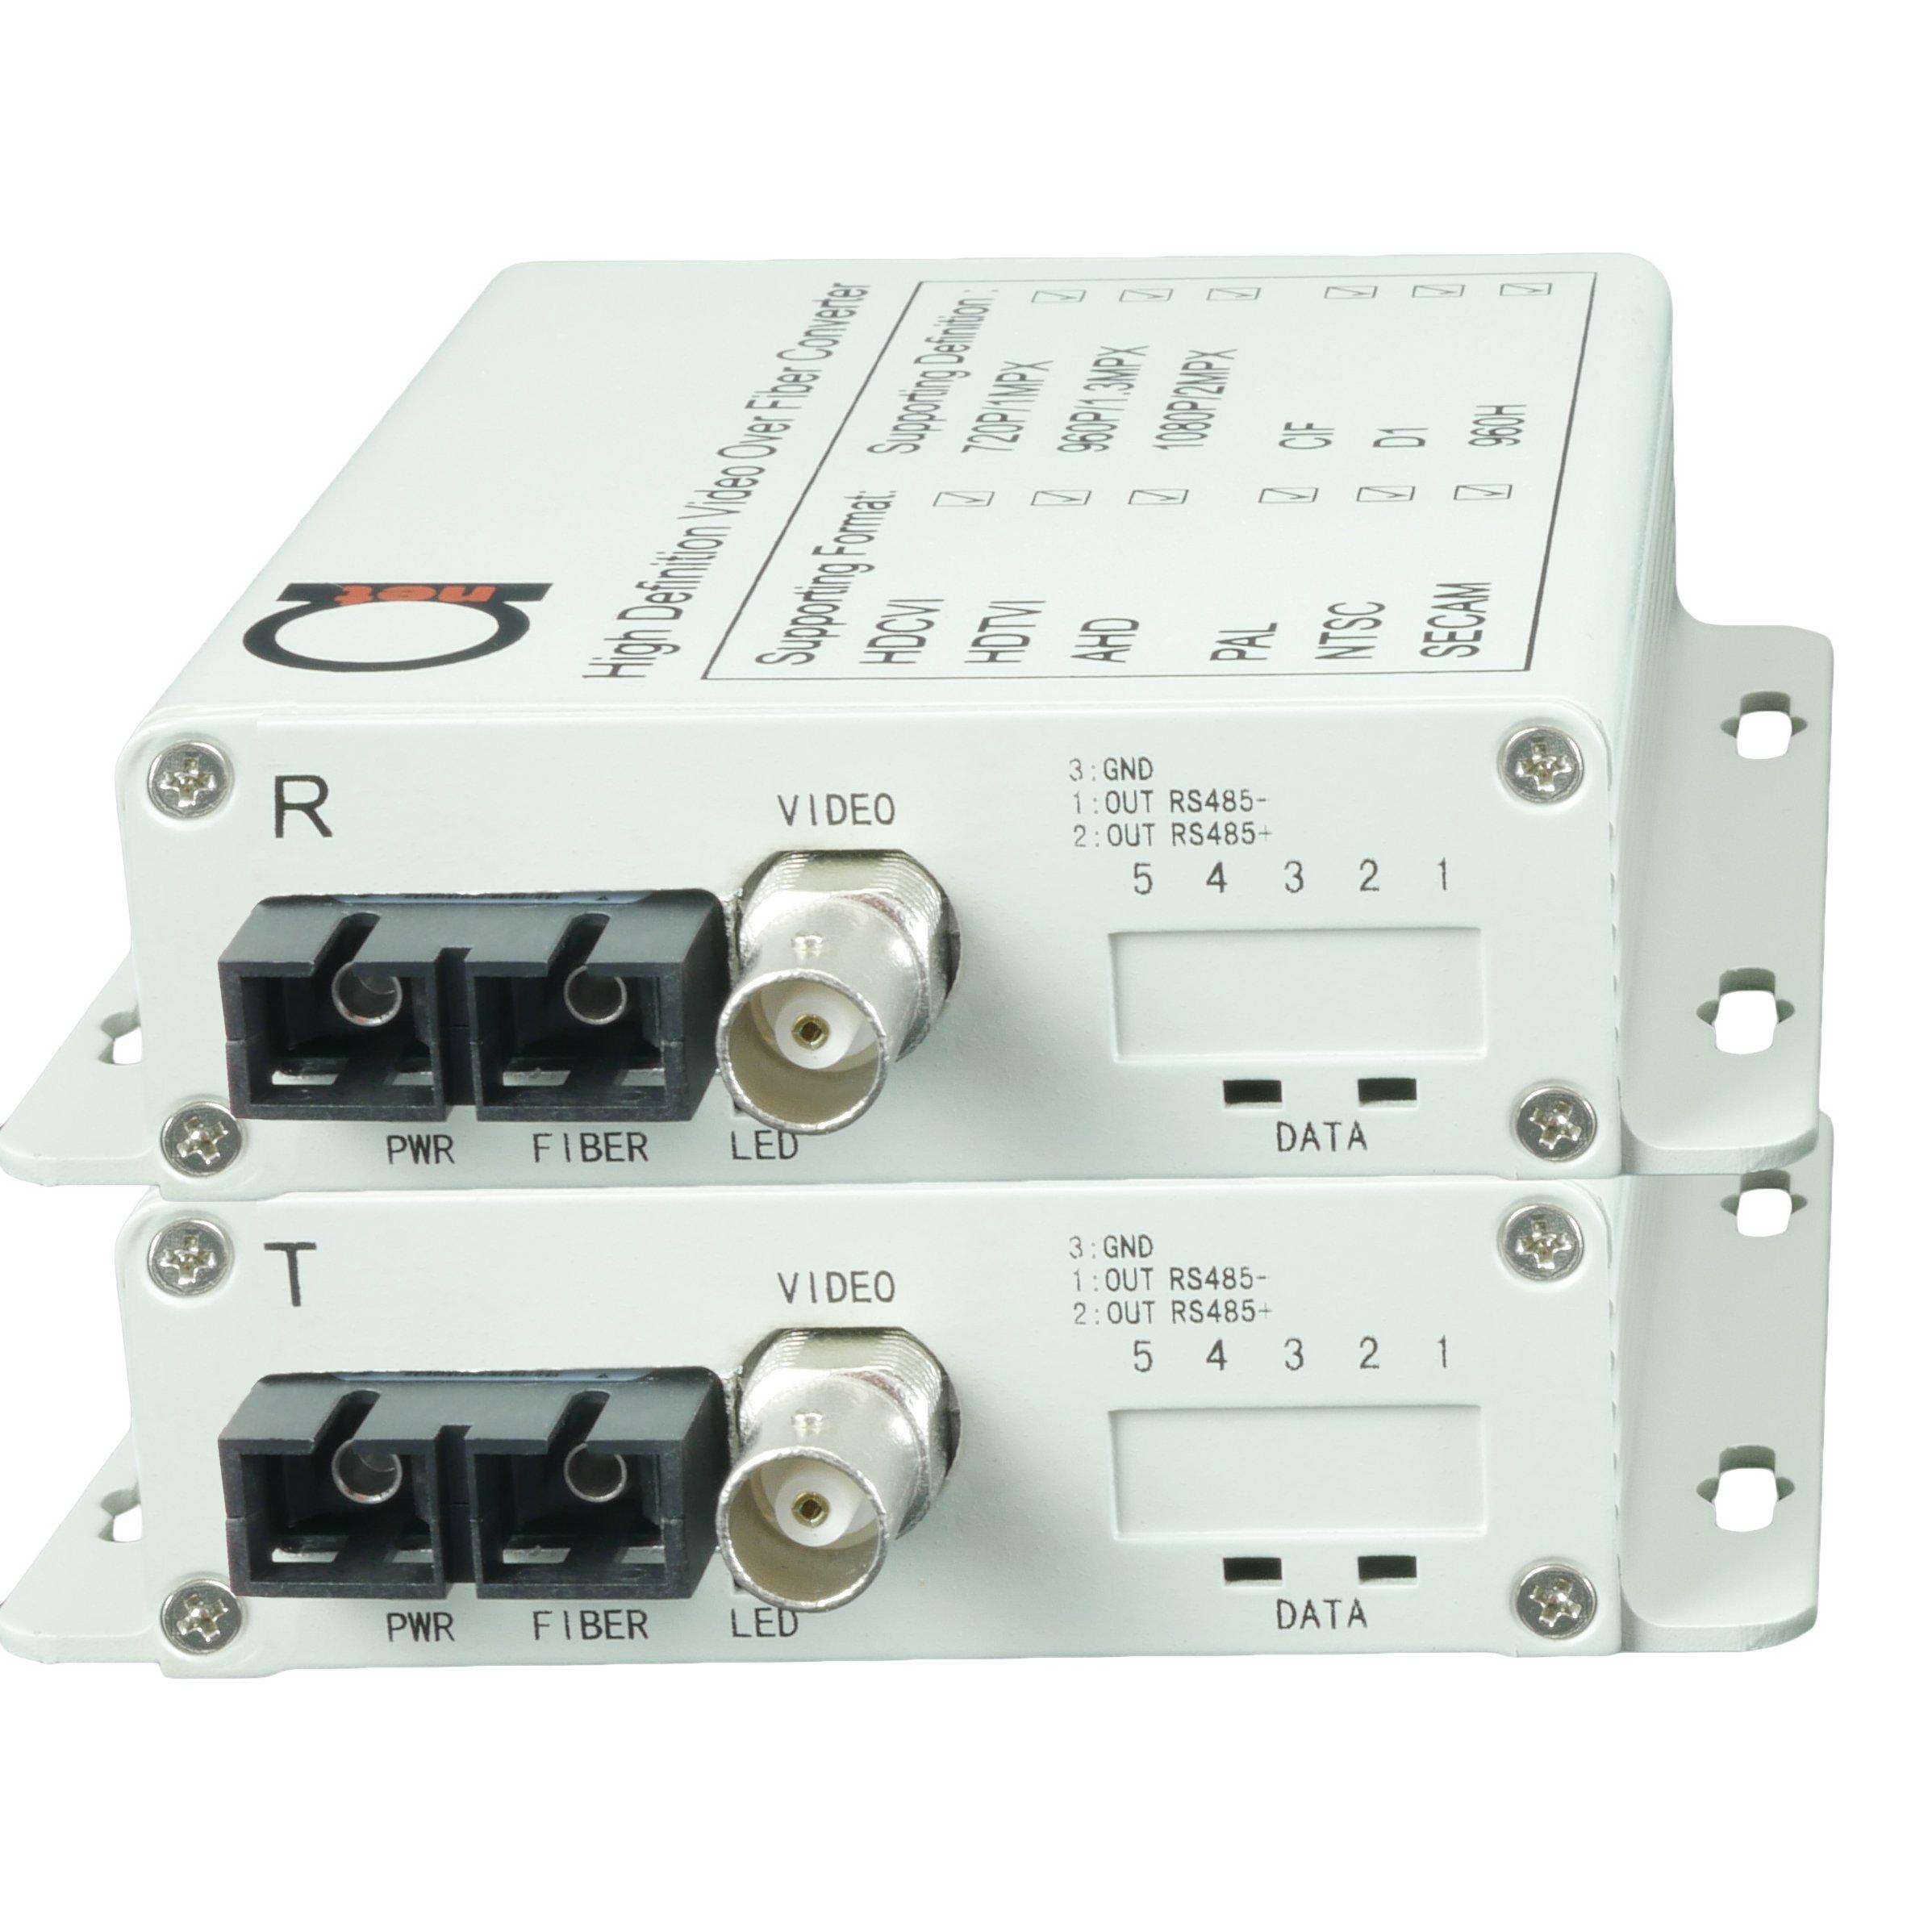 Fiber Converter - Extender Set for HD 1080p & 2560x1920 (AHD | TVI | CVI | CVBS - 4-in-1) Video CCTV Over Fiber - Single & MultiMode - 1 km MM (0.62 mi) 20 km SM (11.42 mi) Transmitter & Receiver 5MPx by ADnet